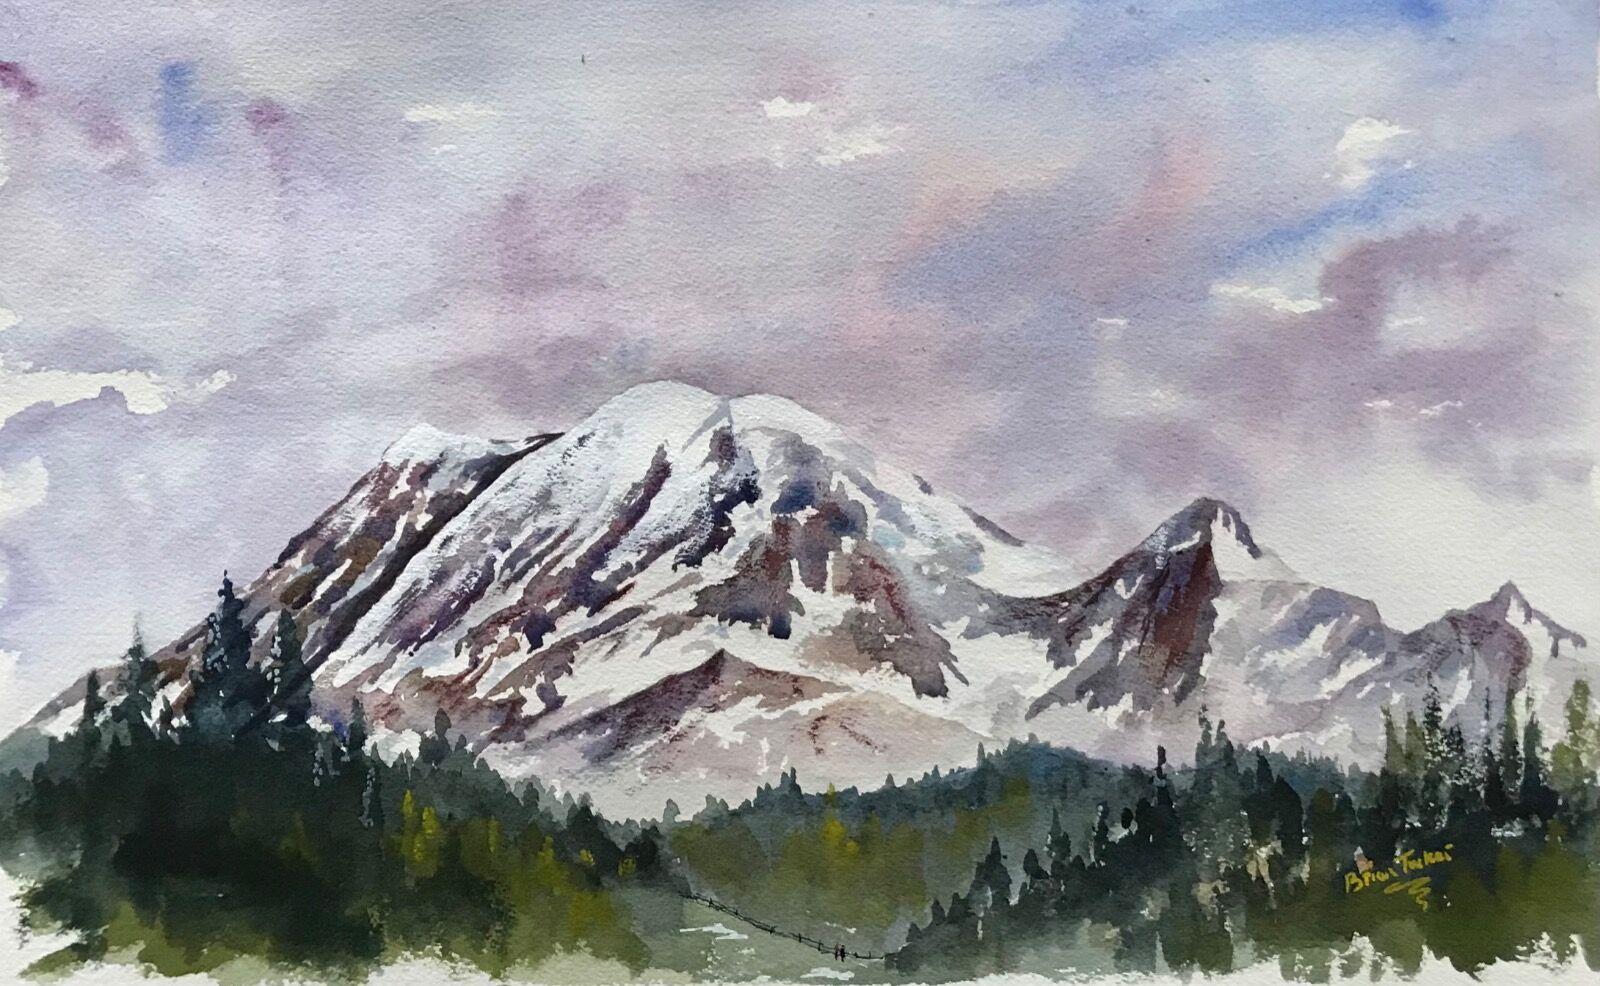 A watercolour of Mount Rainier near Seattle